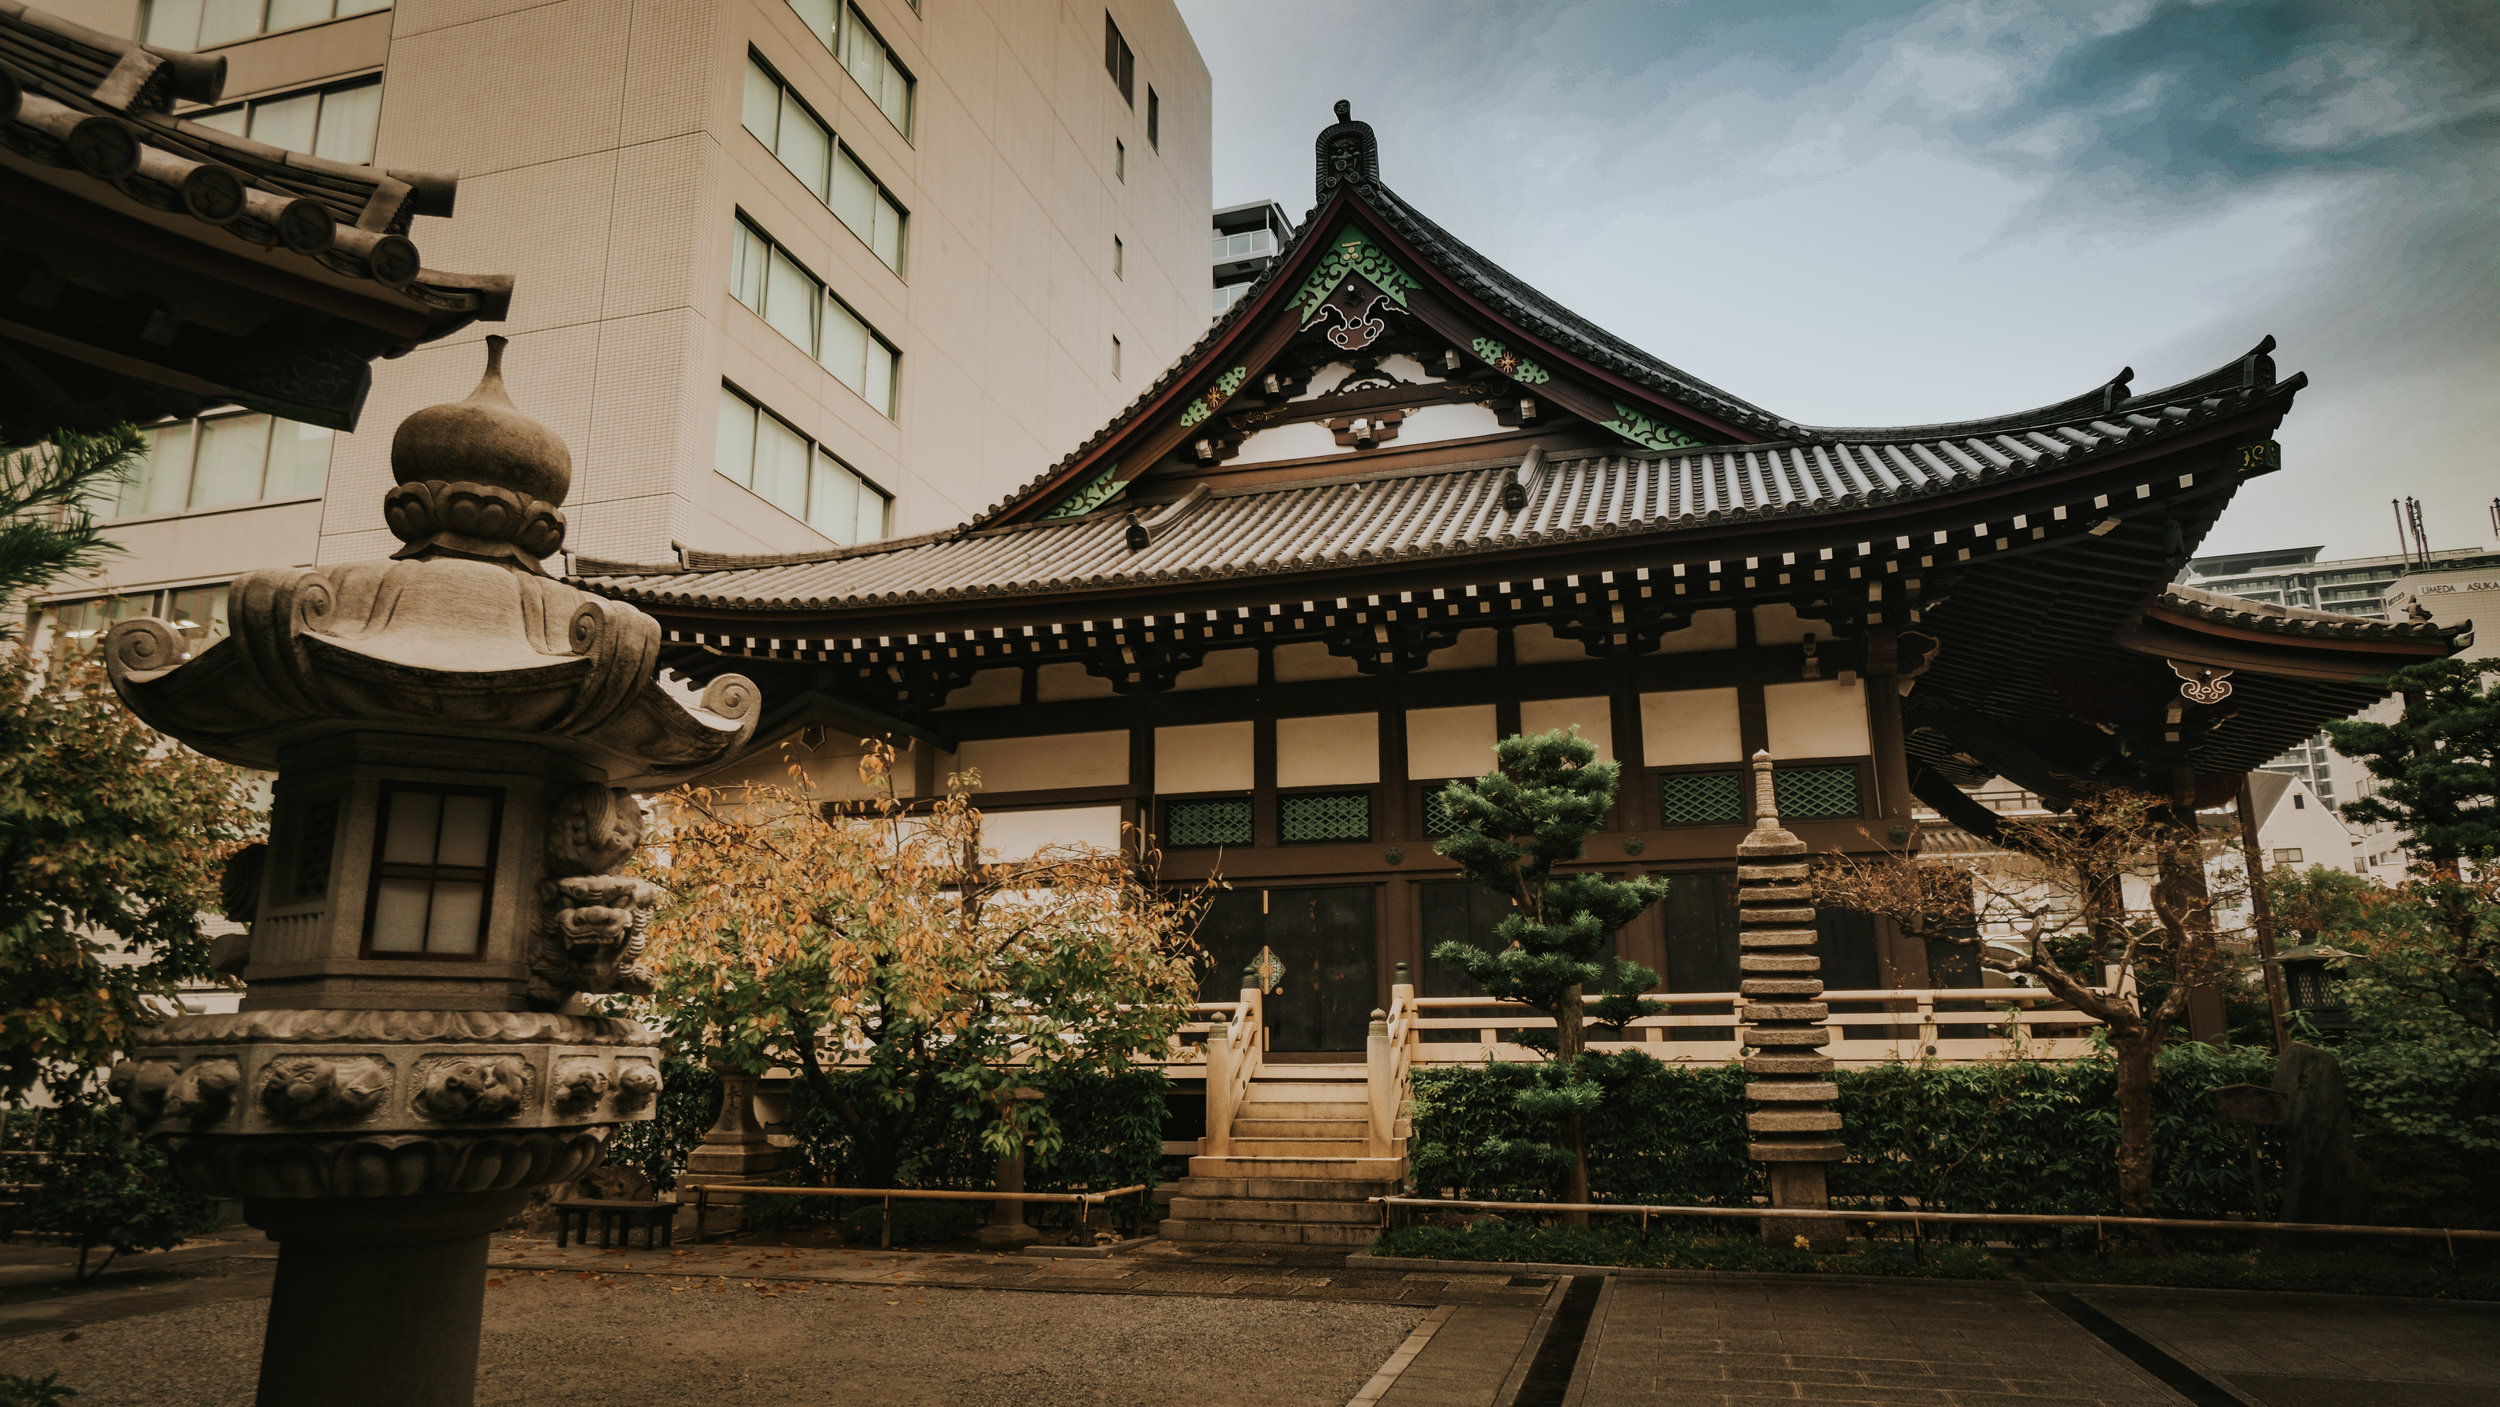 polywander-how-to-travel-japan-day-34-osaka